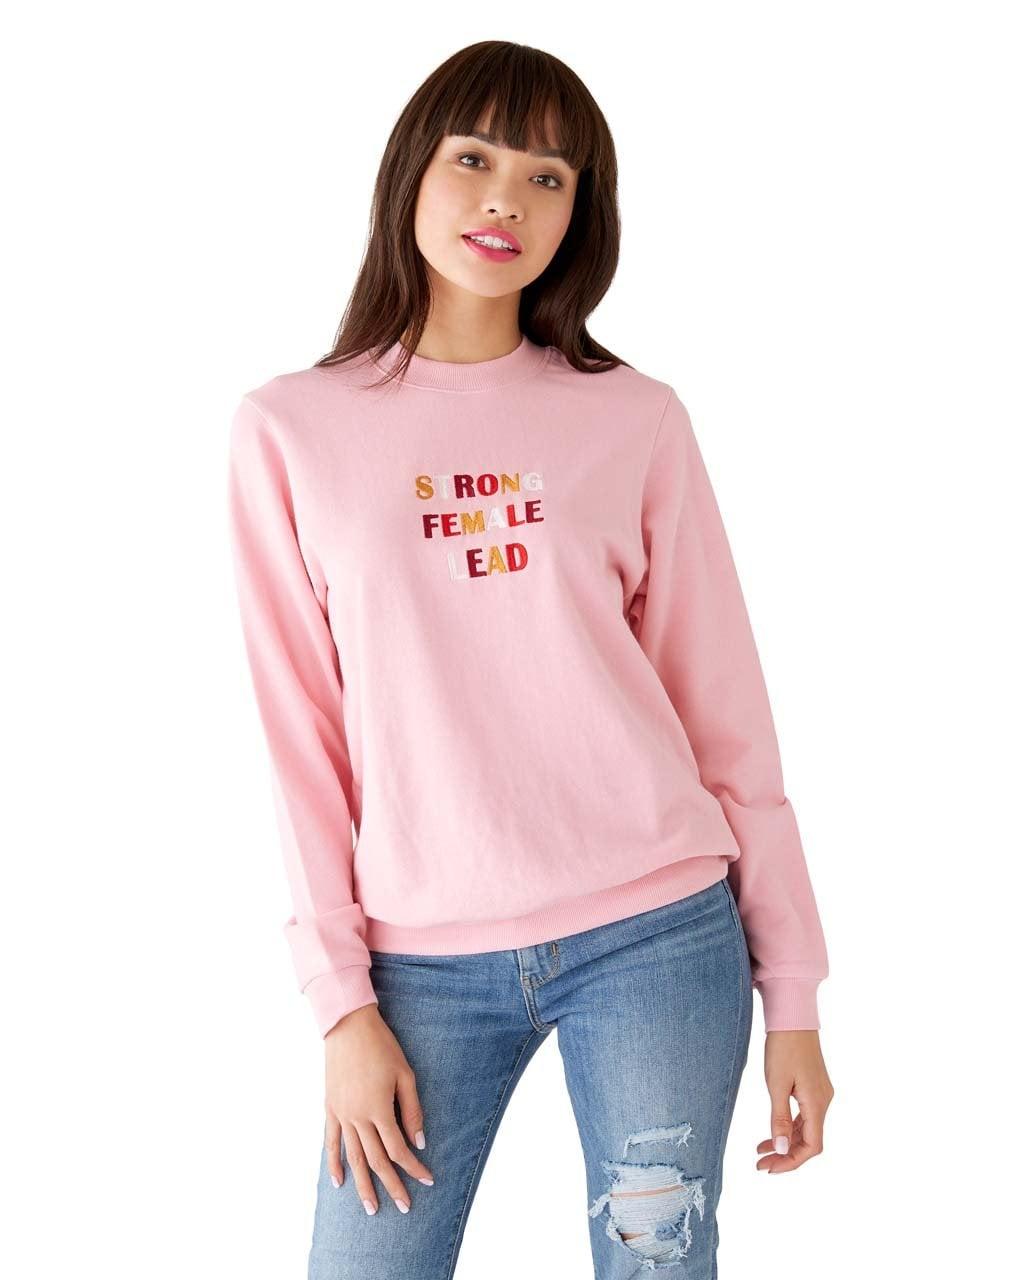 9978c54b5 Ban.do x Realm Strong Female Lead Sweatshirt | Want to Wear Pajamas ...